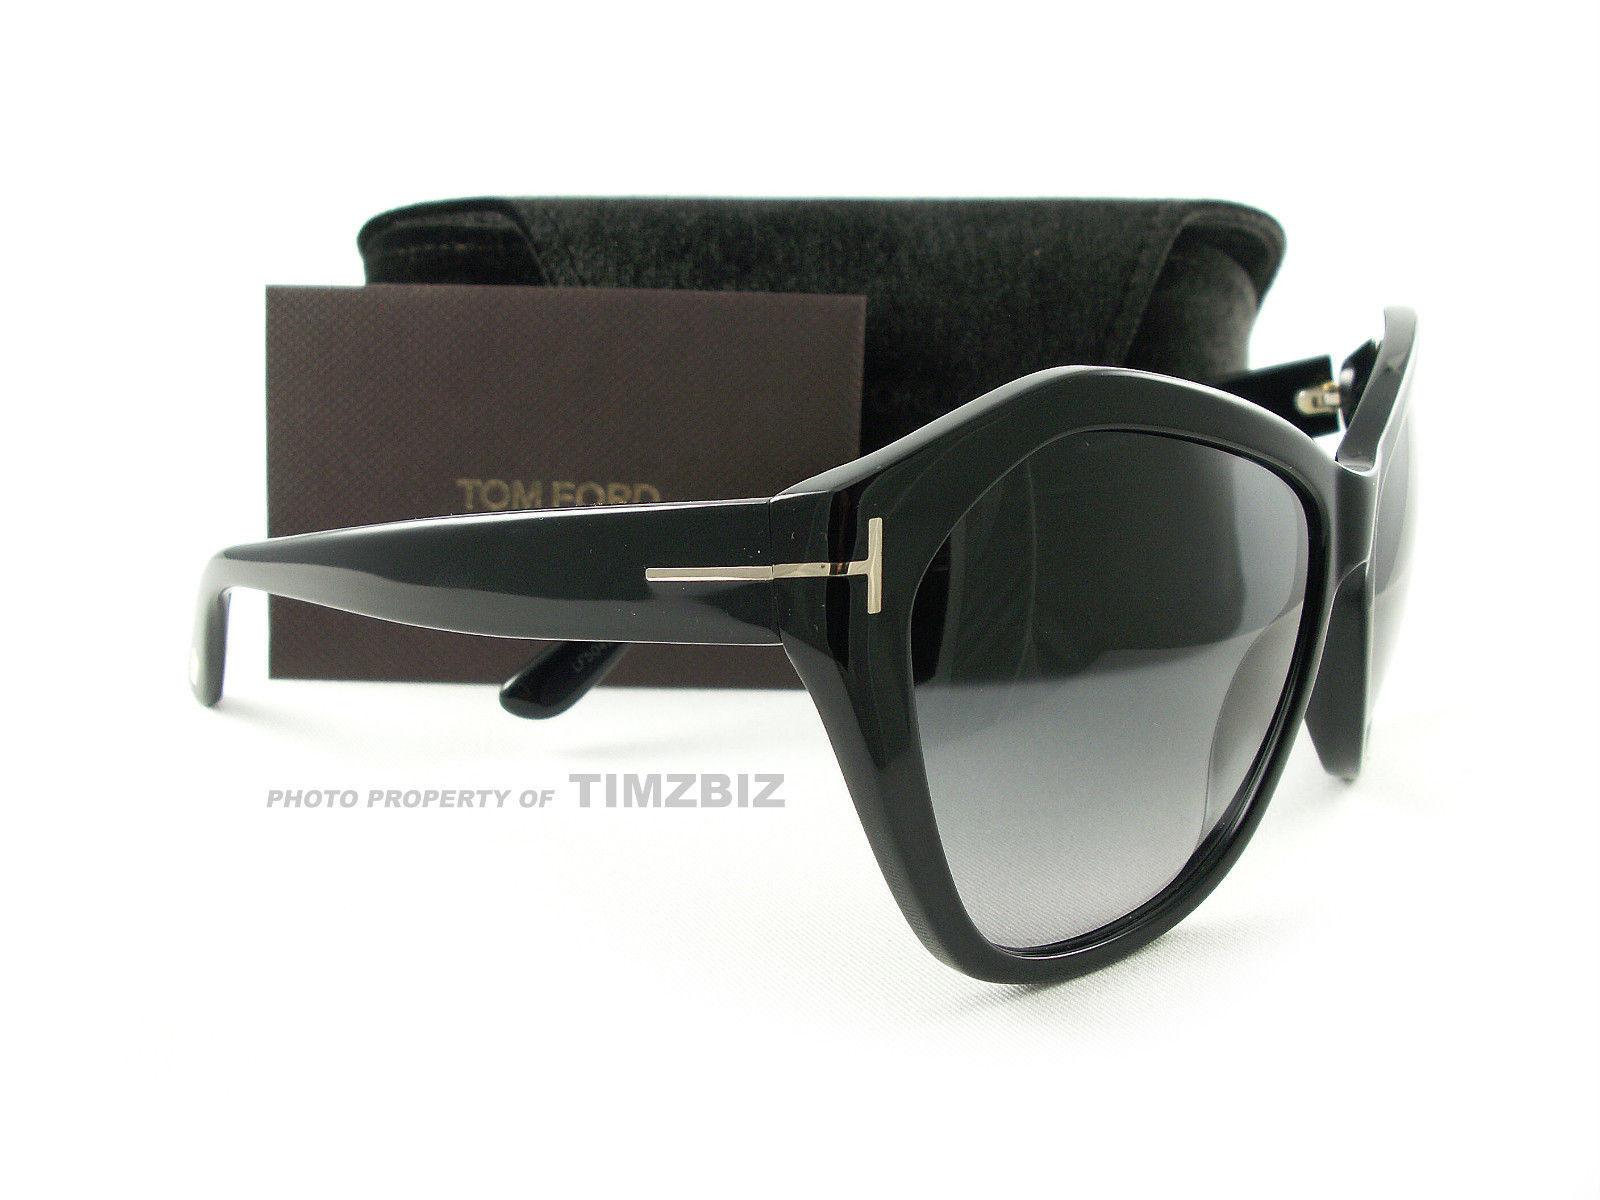 a36db78f90 New Tom Ford Sunglasses TF317 Angelina 01B and 50 similar items